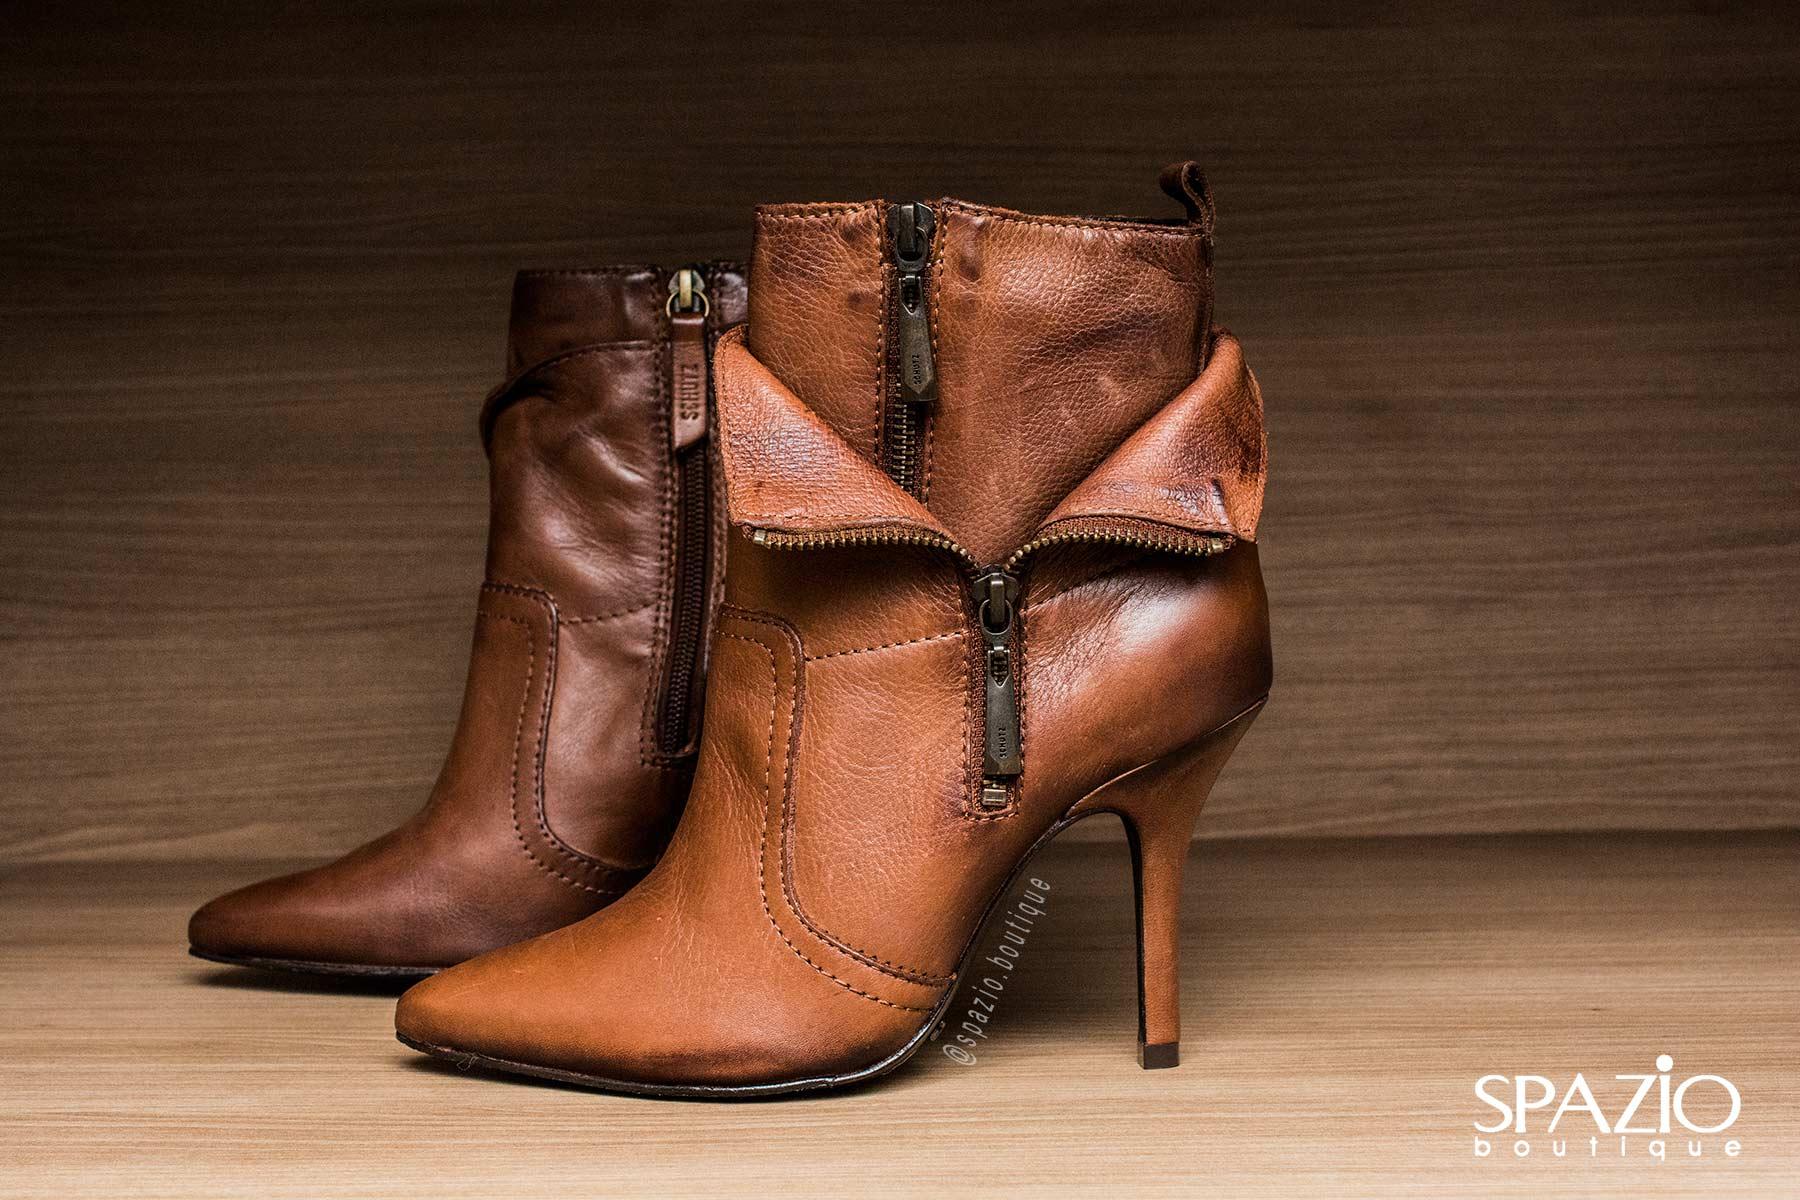 079f63537 botas femininas schutz